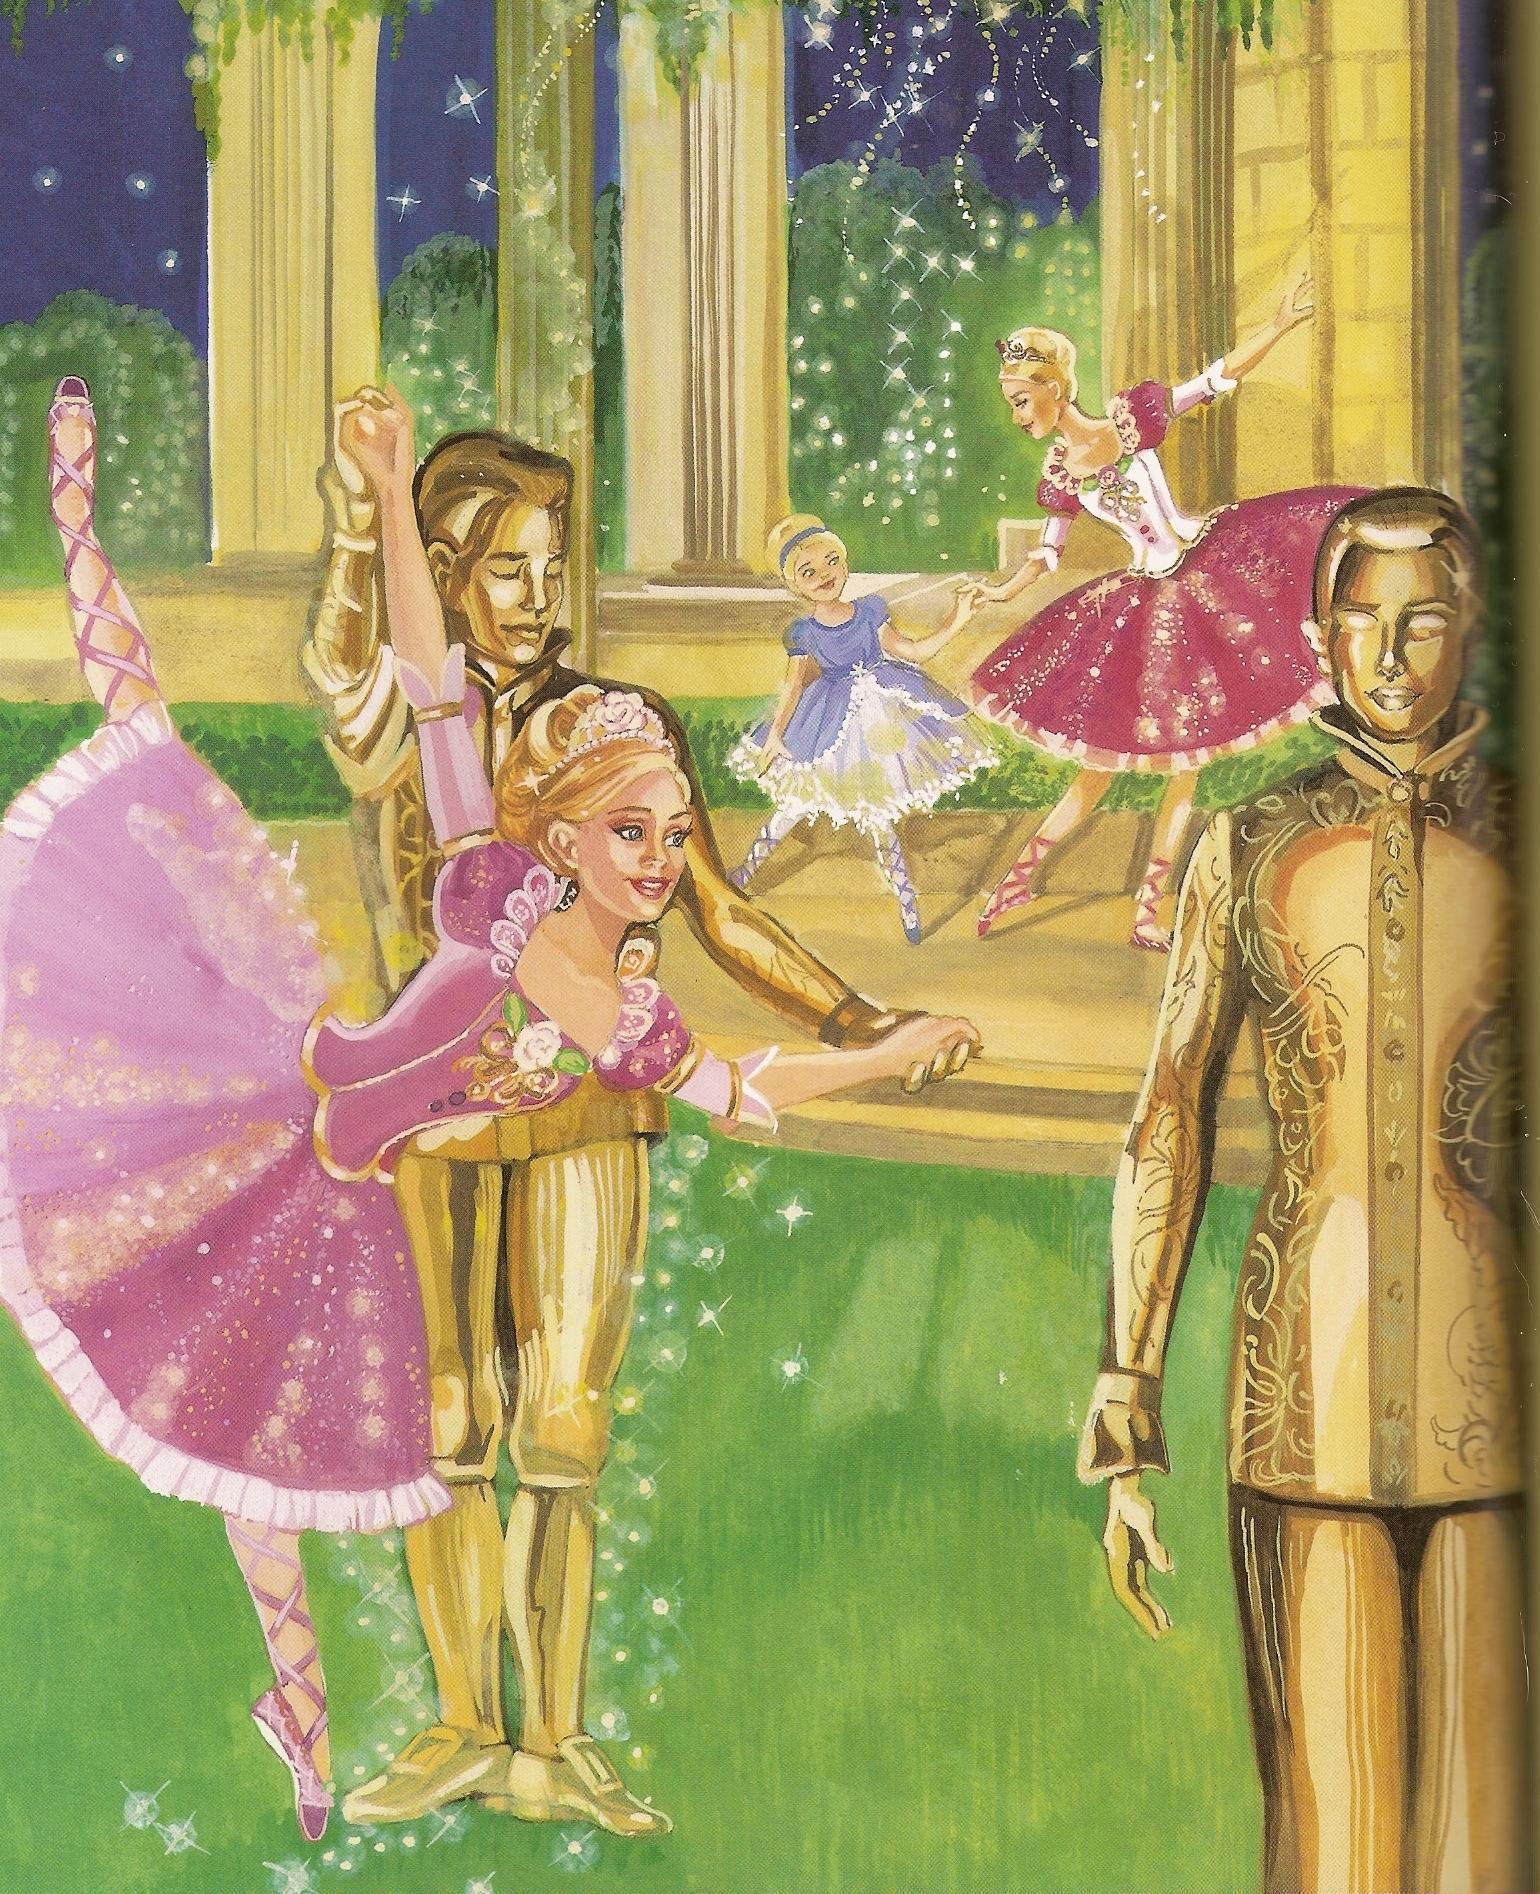 Barbie In The 12 Dancing Princesses- Soundtrack details